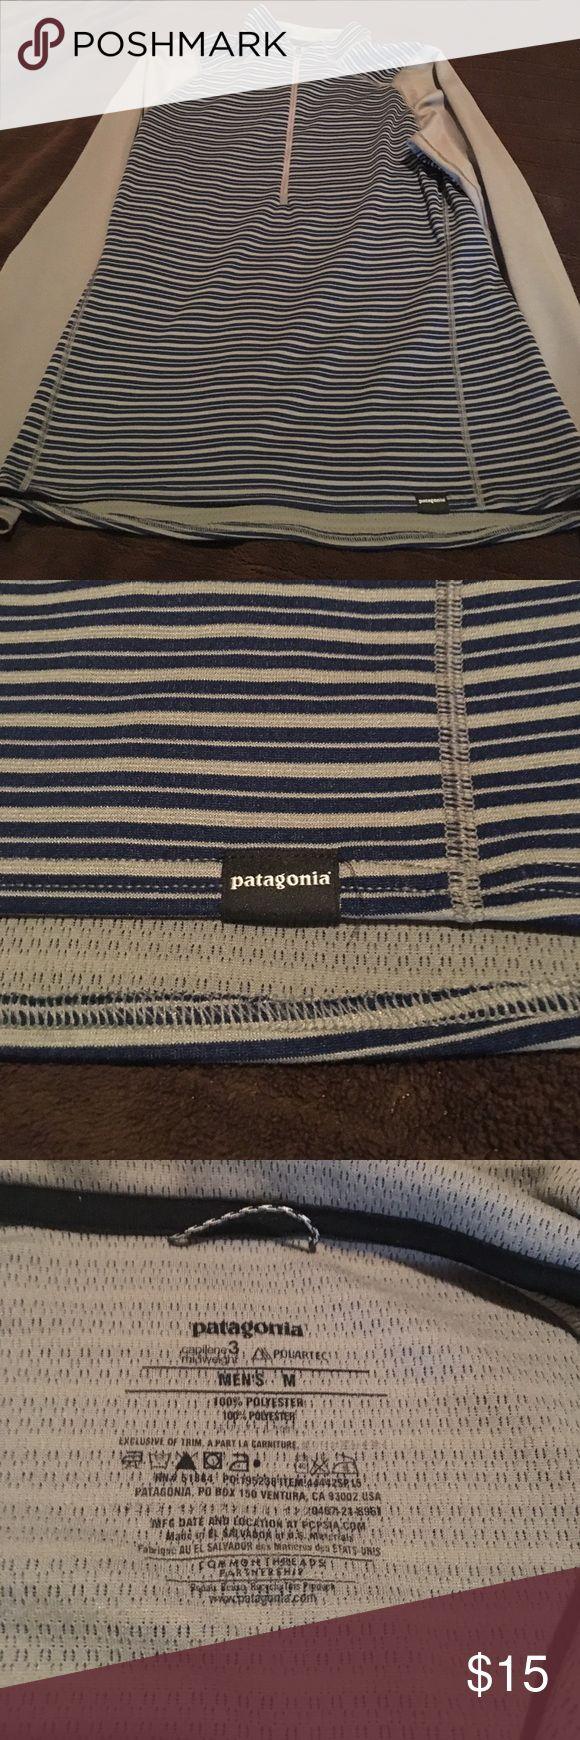 Men's Patagonia ski base layer Practically brand new. Grey with blue stripes. Patagonia Shirts Tees - Long Sleeve